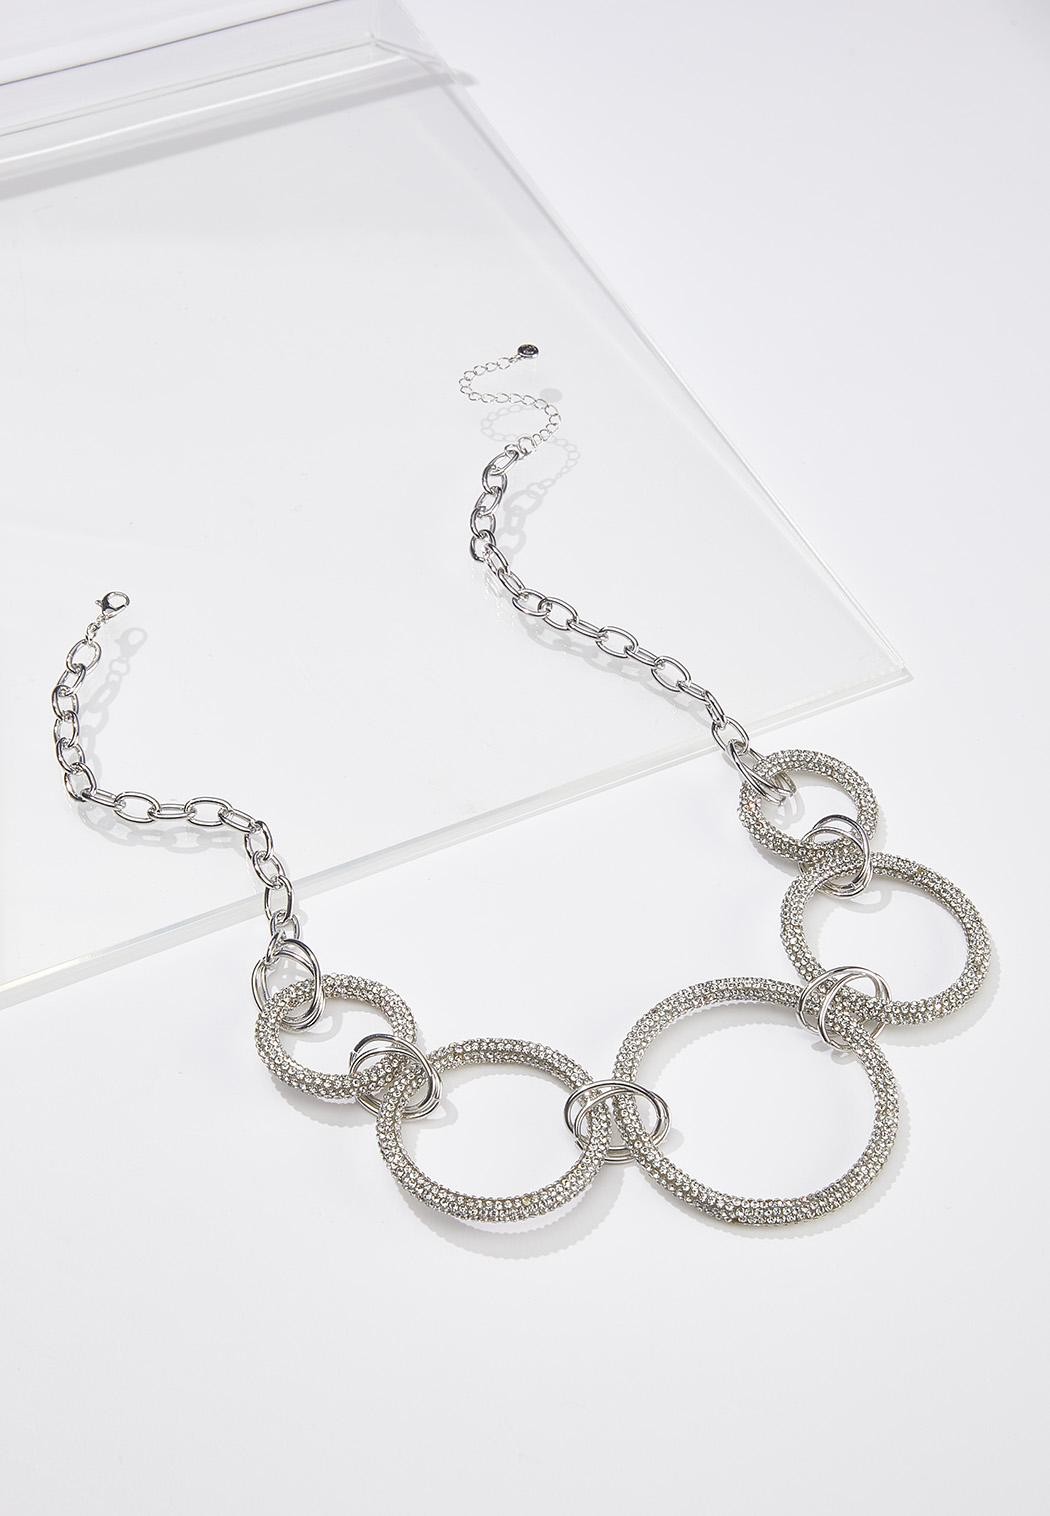 Mesh Rhinestone Ring Necklace